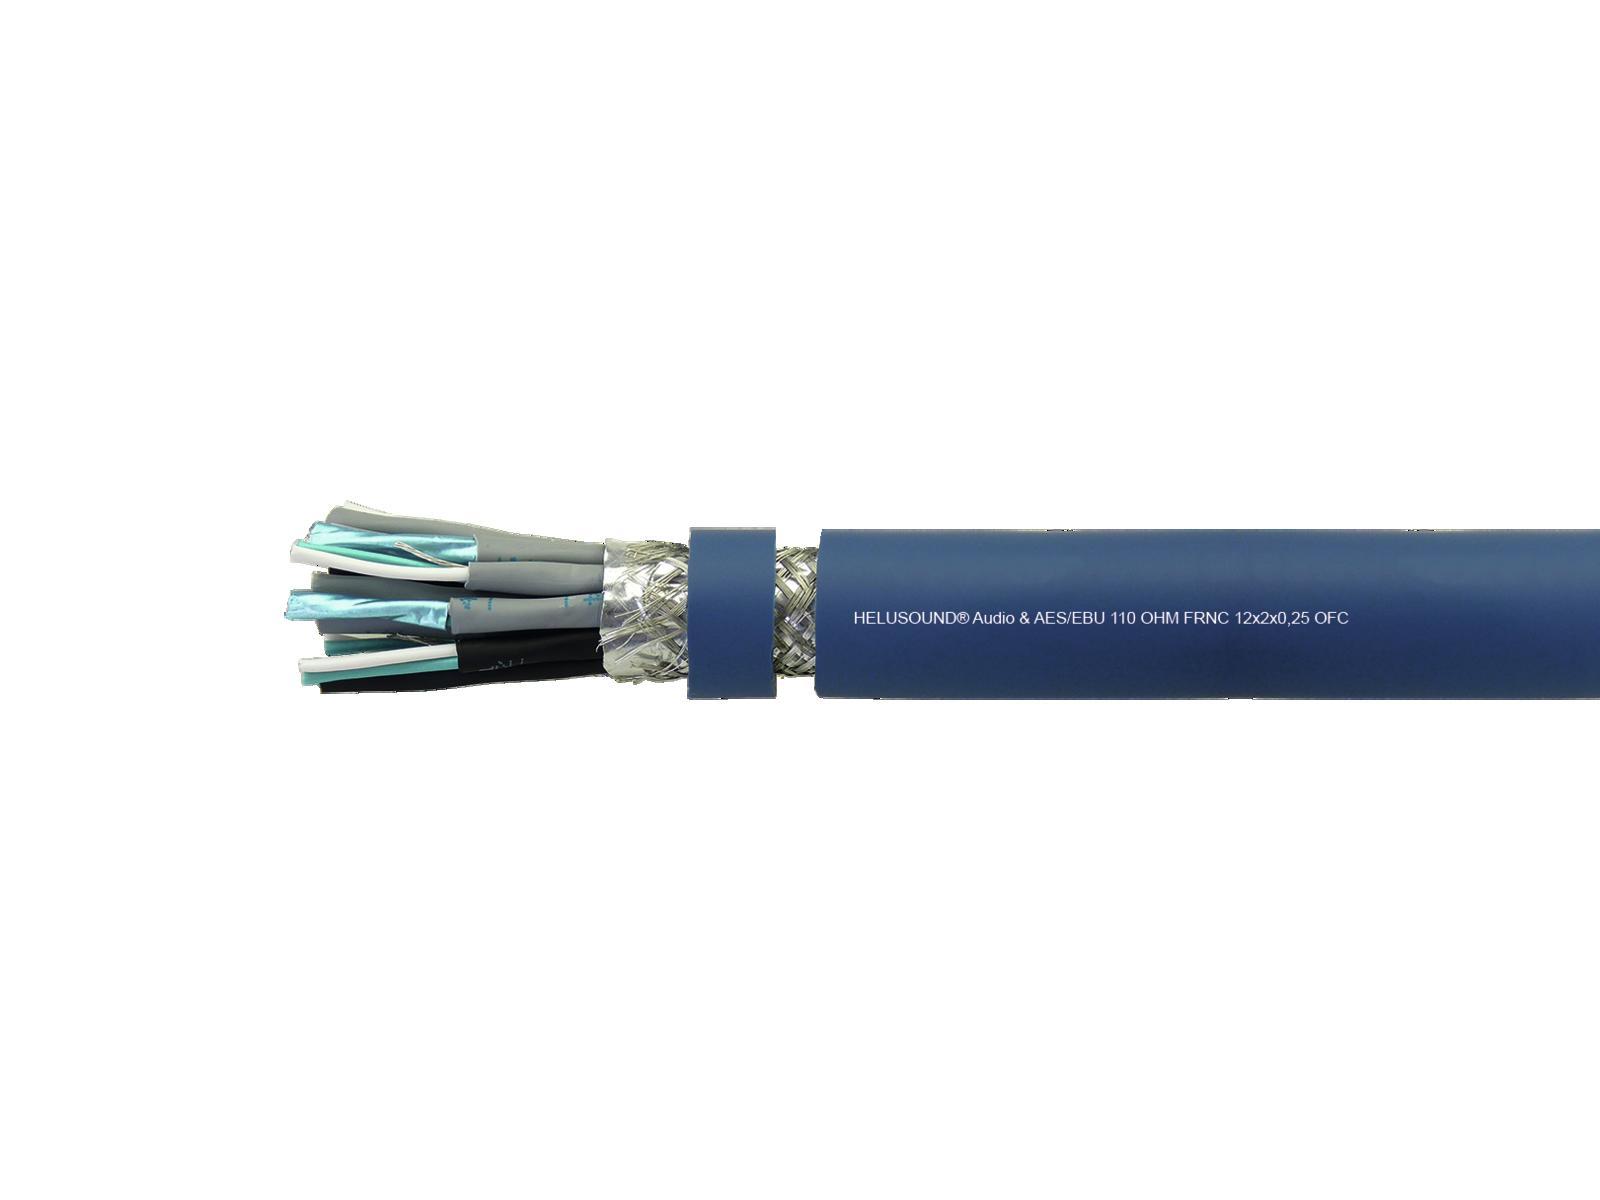 HELUKABEL Audiokabel 12x2x0,25 AES/EBU 100m